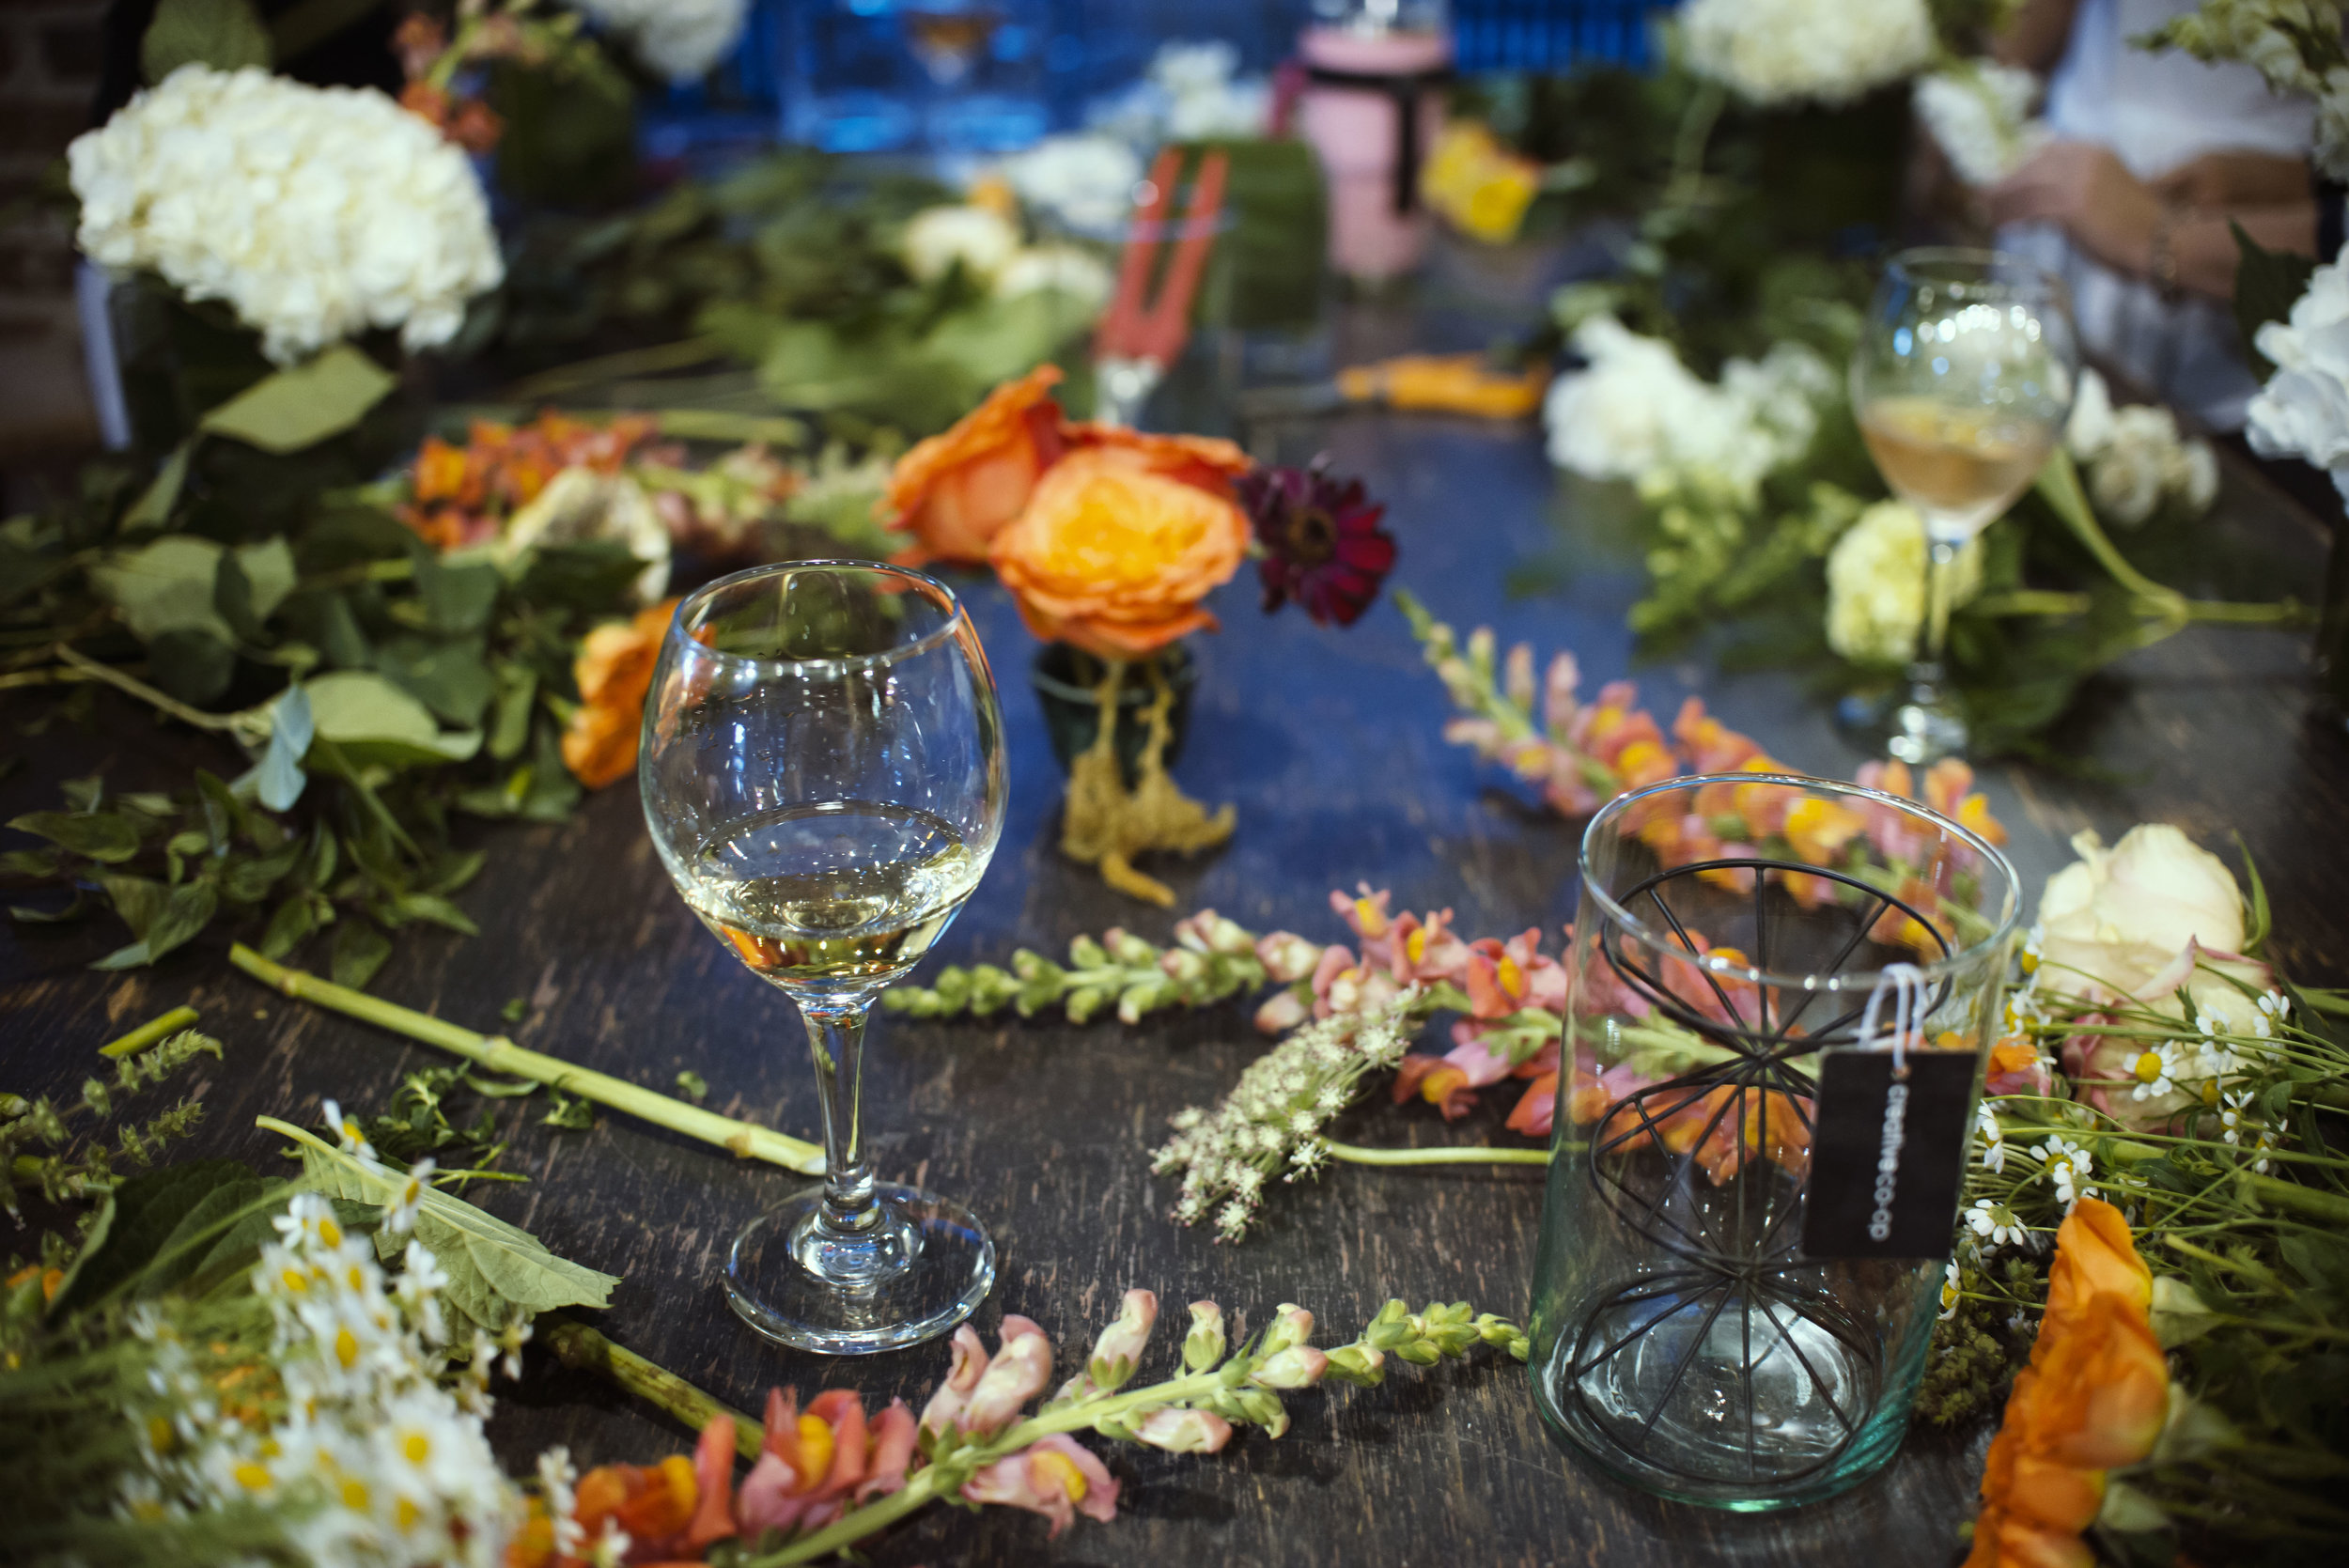 introduction to floral design workshop at mitchs flowers stephanie tarrant monique chauvin denys mertz1.jpg